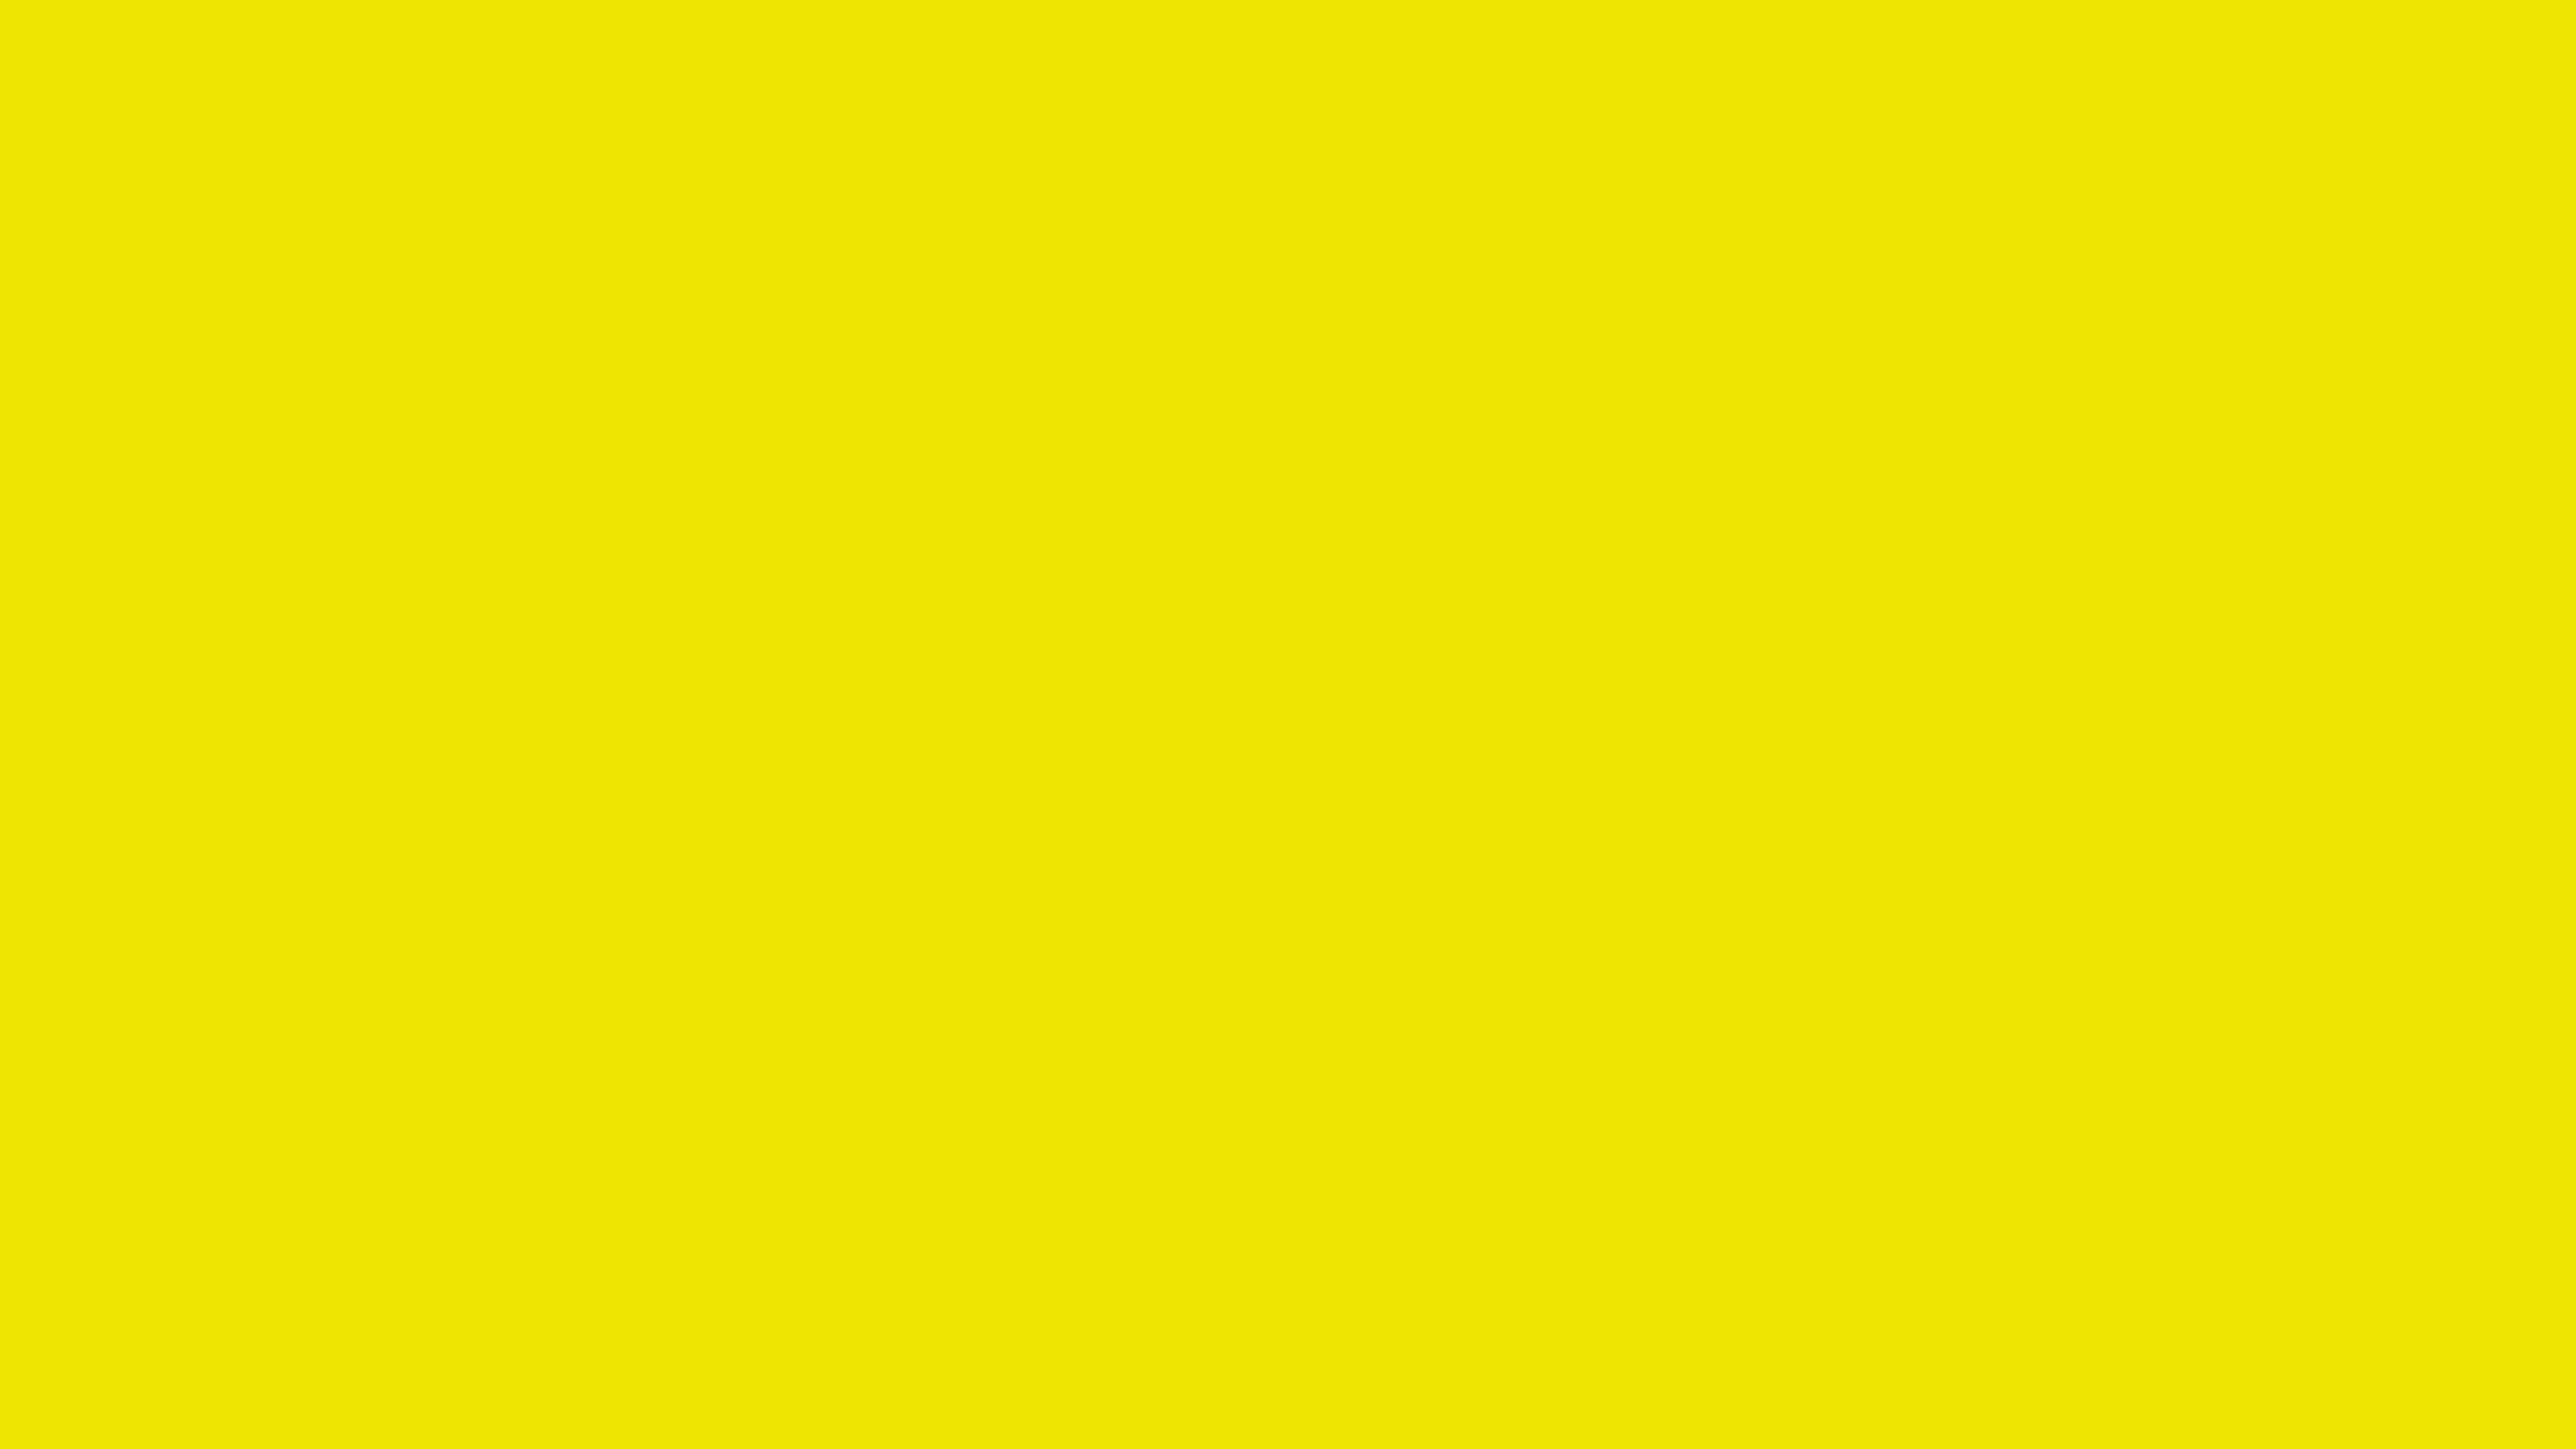 4096x2304 Titanium Yellow Solid Color Background